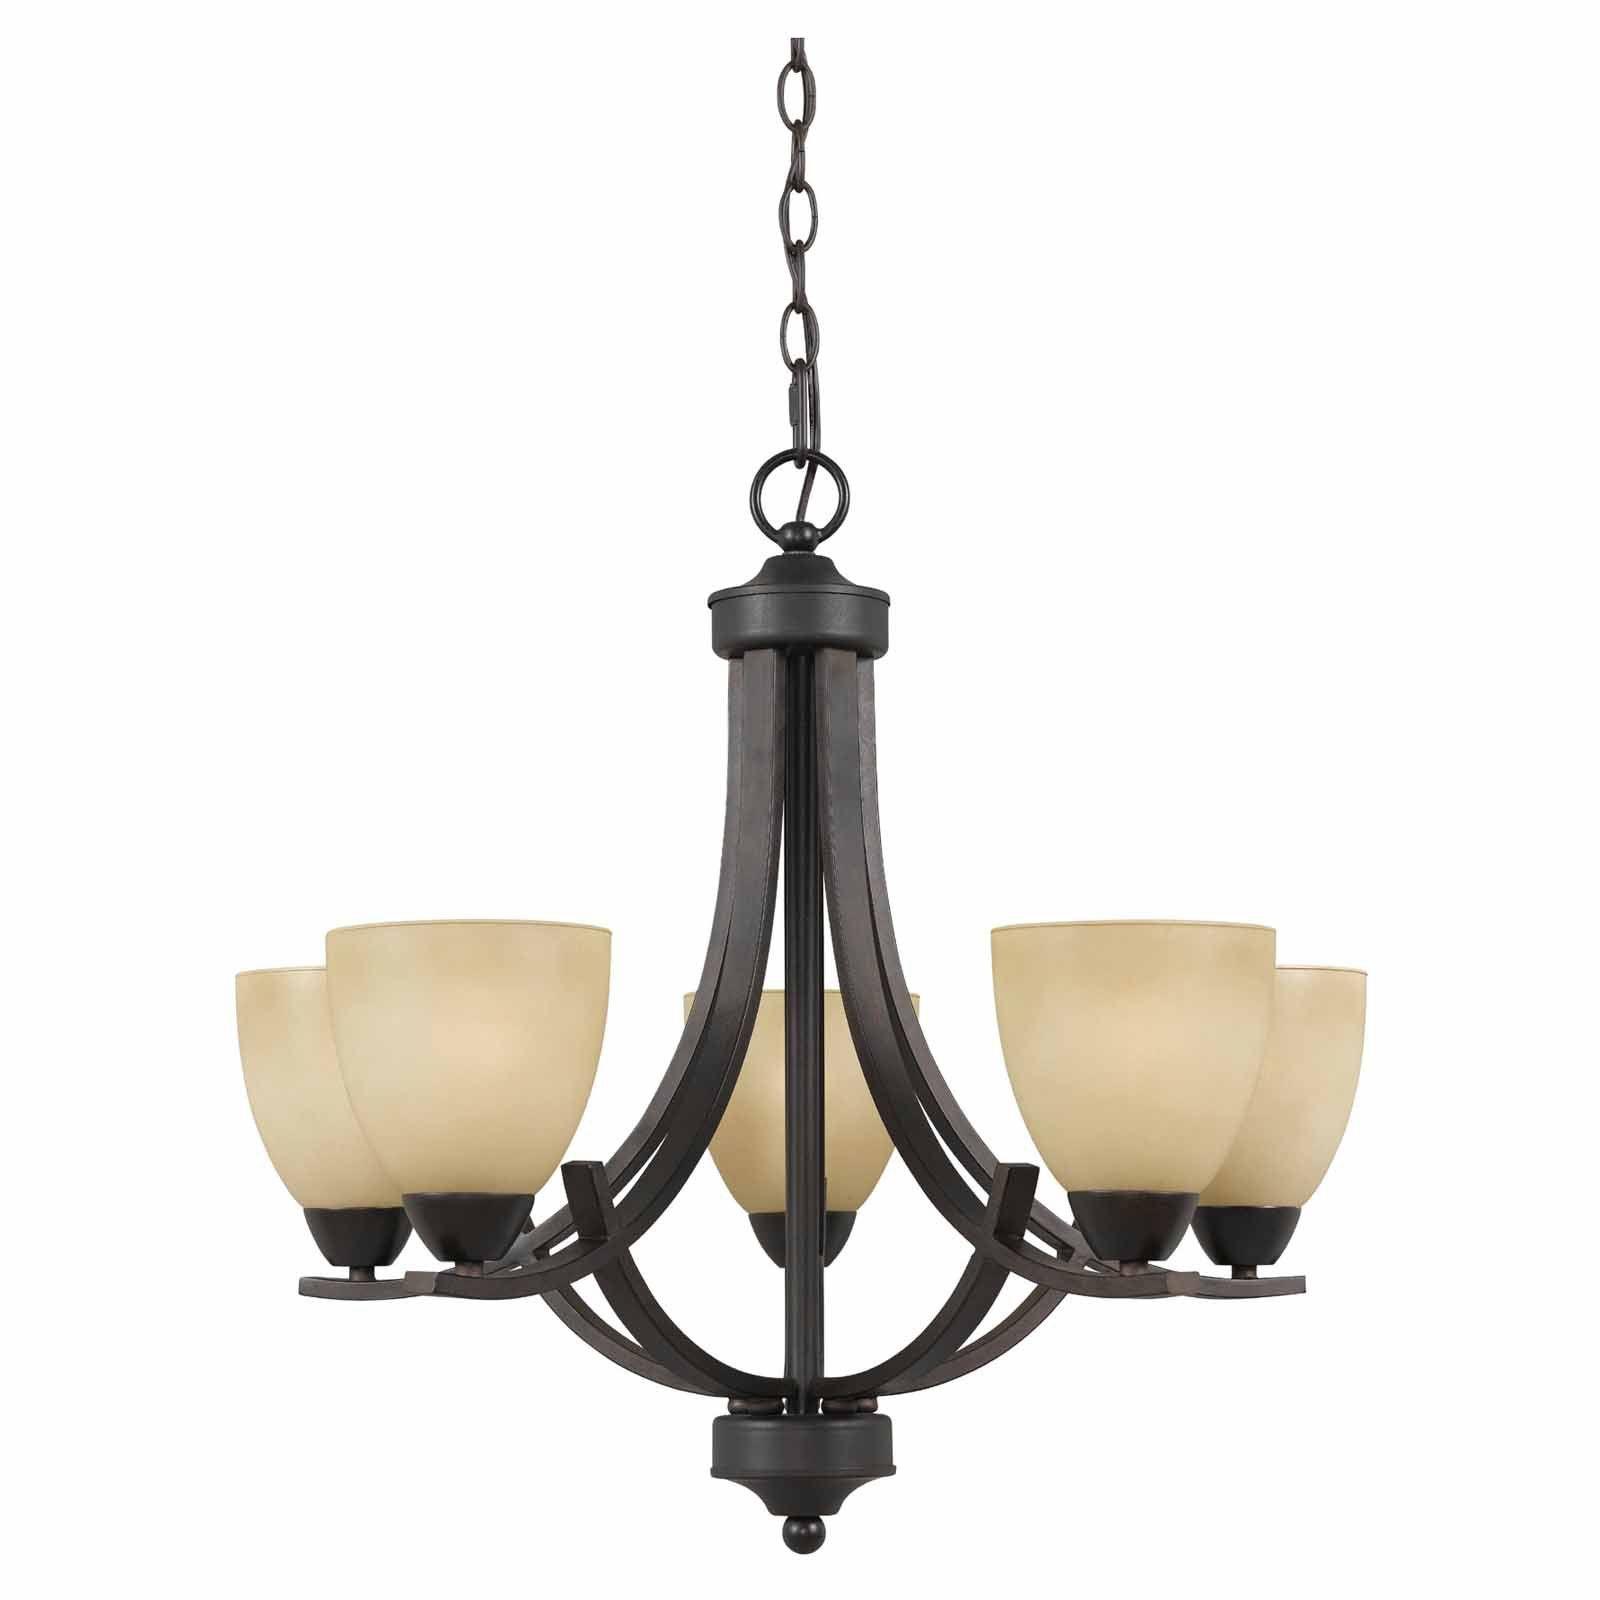 Lumenno value light chandelier products pinterest